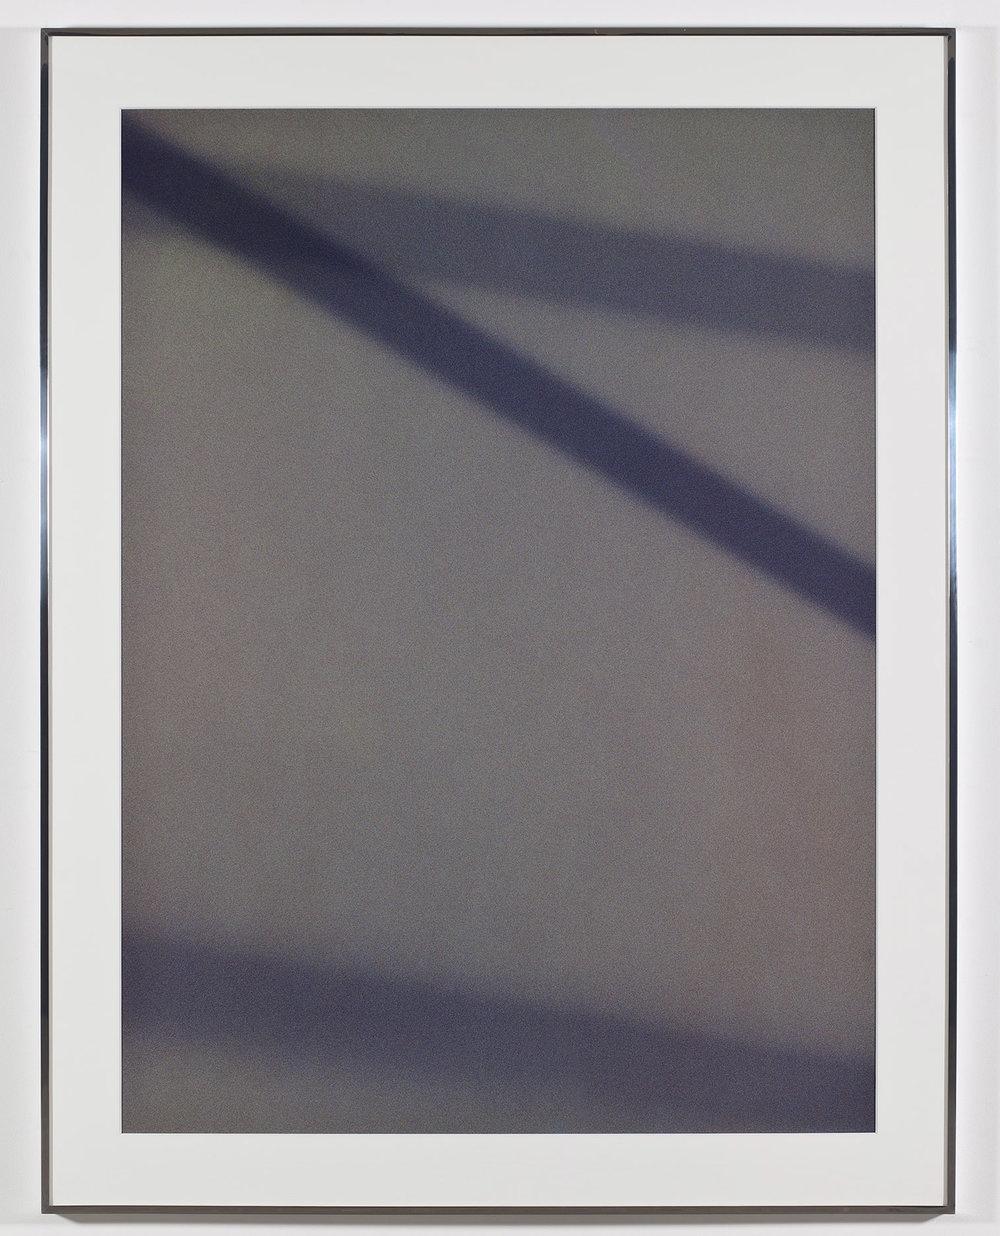 Transparency (Positive) [Fujichrome RDPIII Provia 100F Em. No. 05481: November 28–30, 2010 LAX/MIA MIA/LAX]   2011  Epson Ultrachrome K3 archival ink jet print on Museo Silver Rag Paper  68 x 52 1/4 inches   Transparencies, 2008–2014    Diapositives, 2011